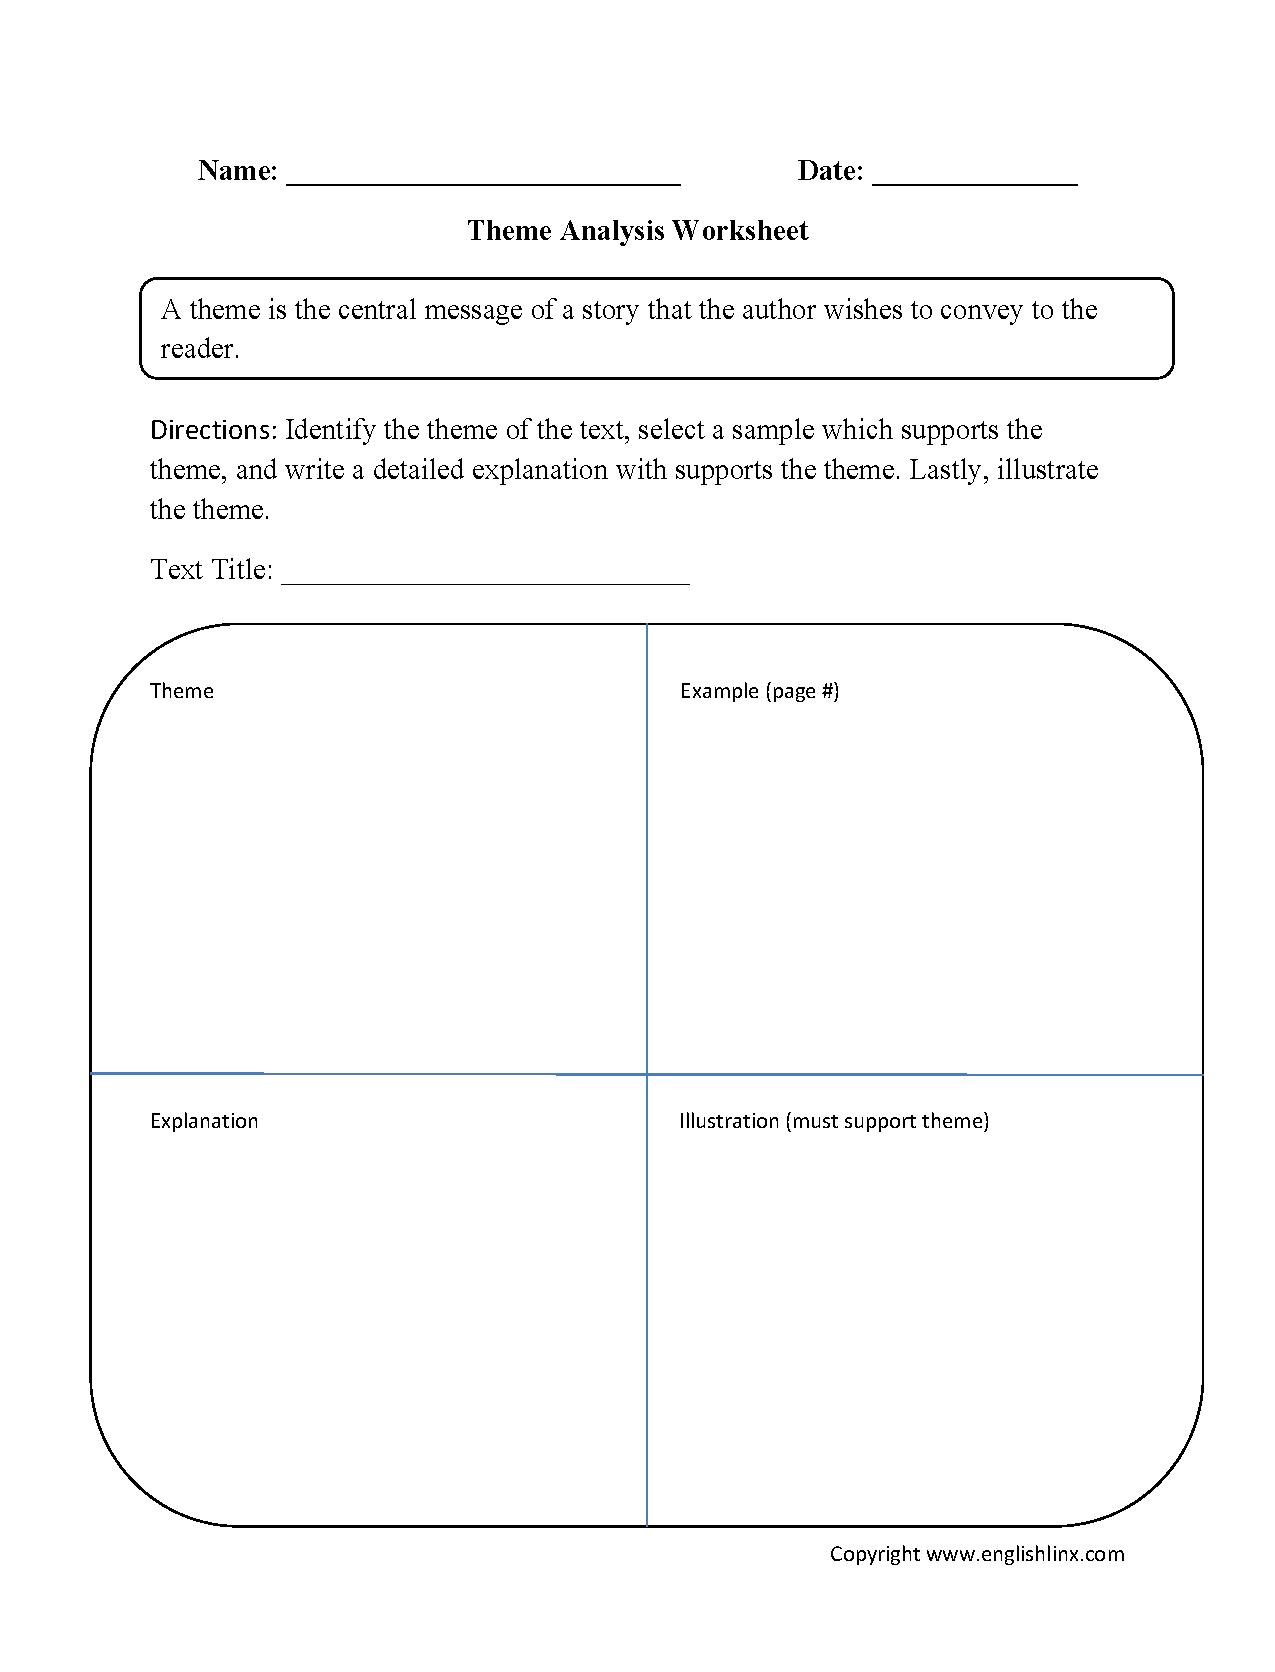 Themeysis Worksheet